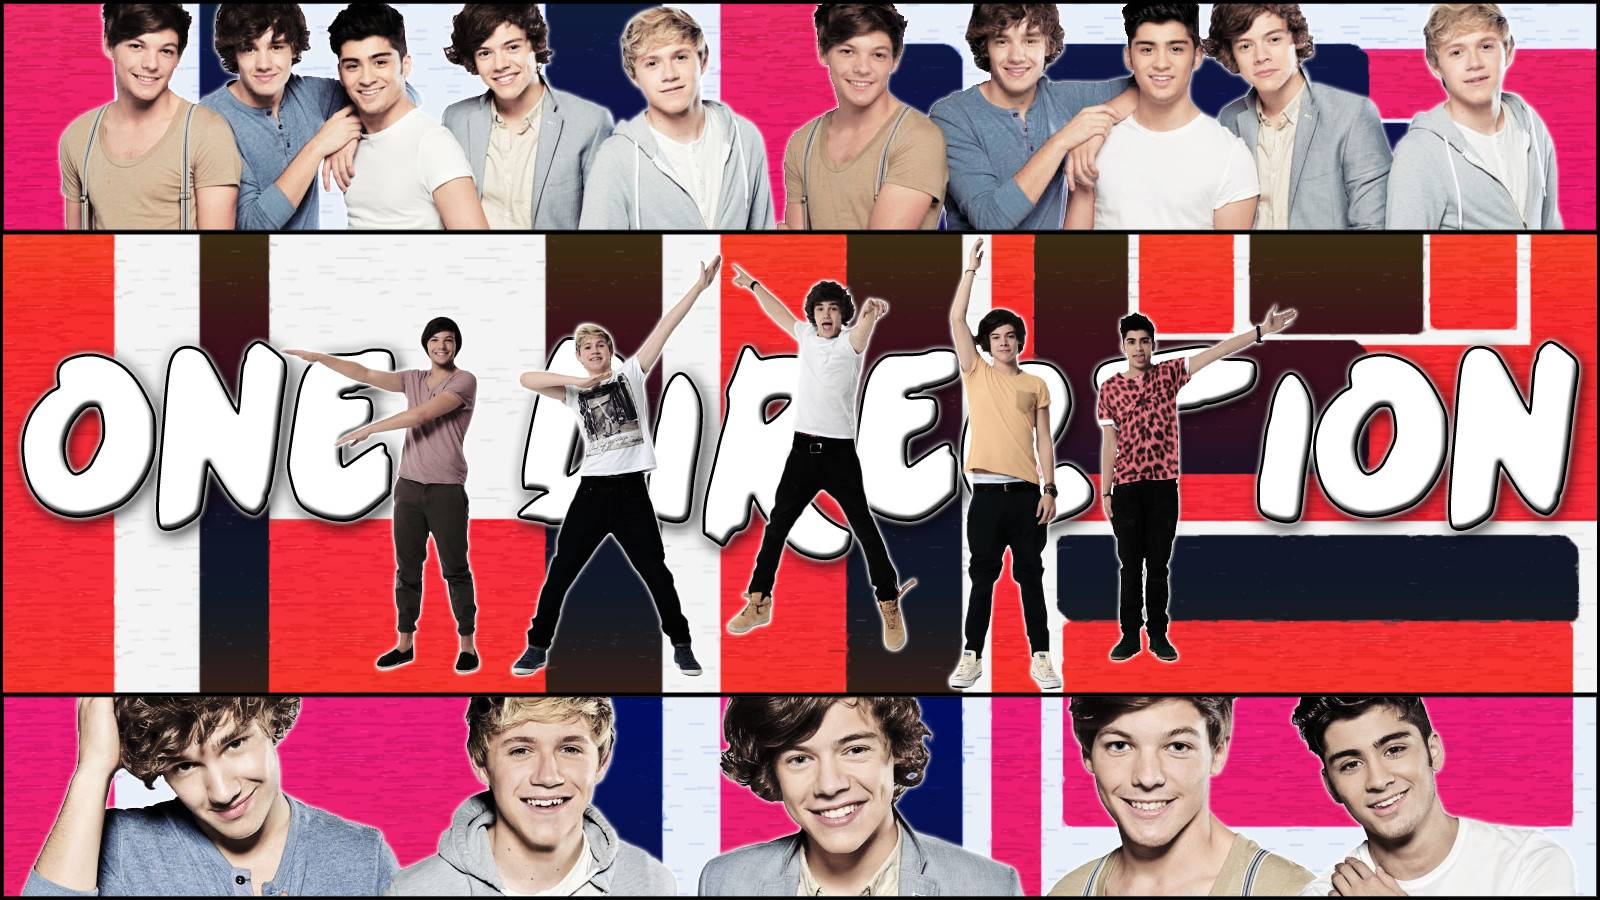 One Direction Wallpaper D   One Direction Wallpaper 1600x900